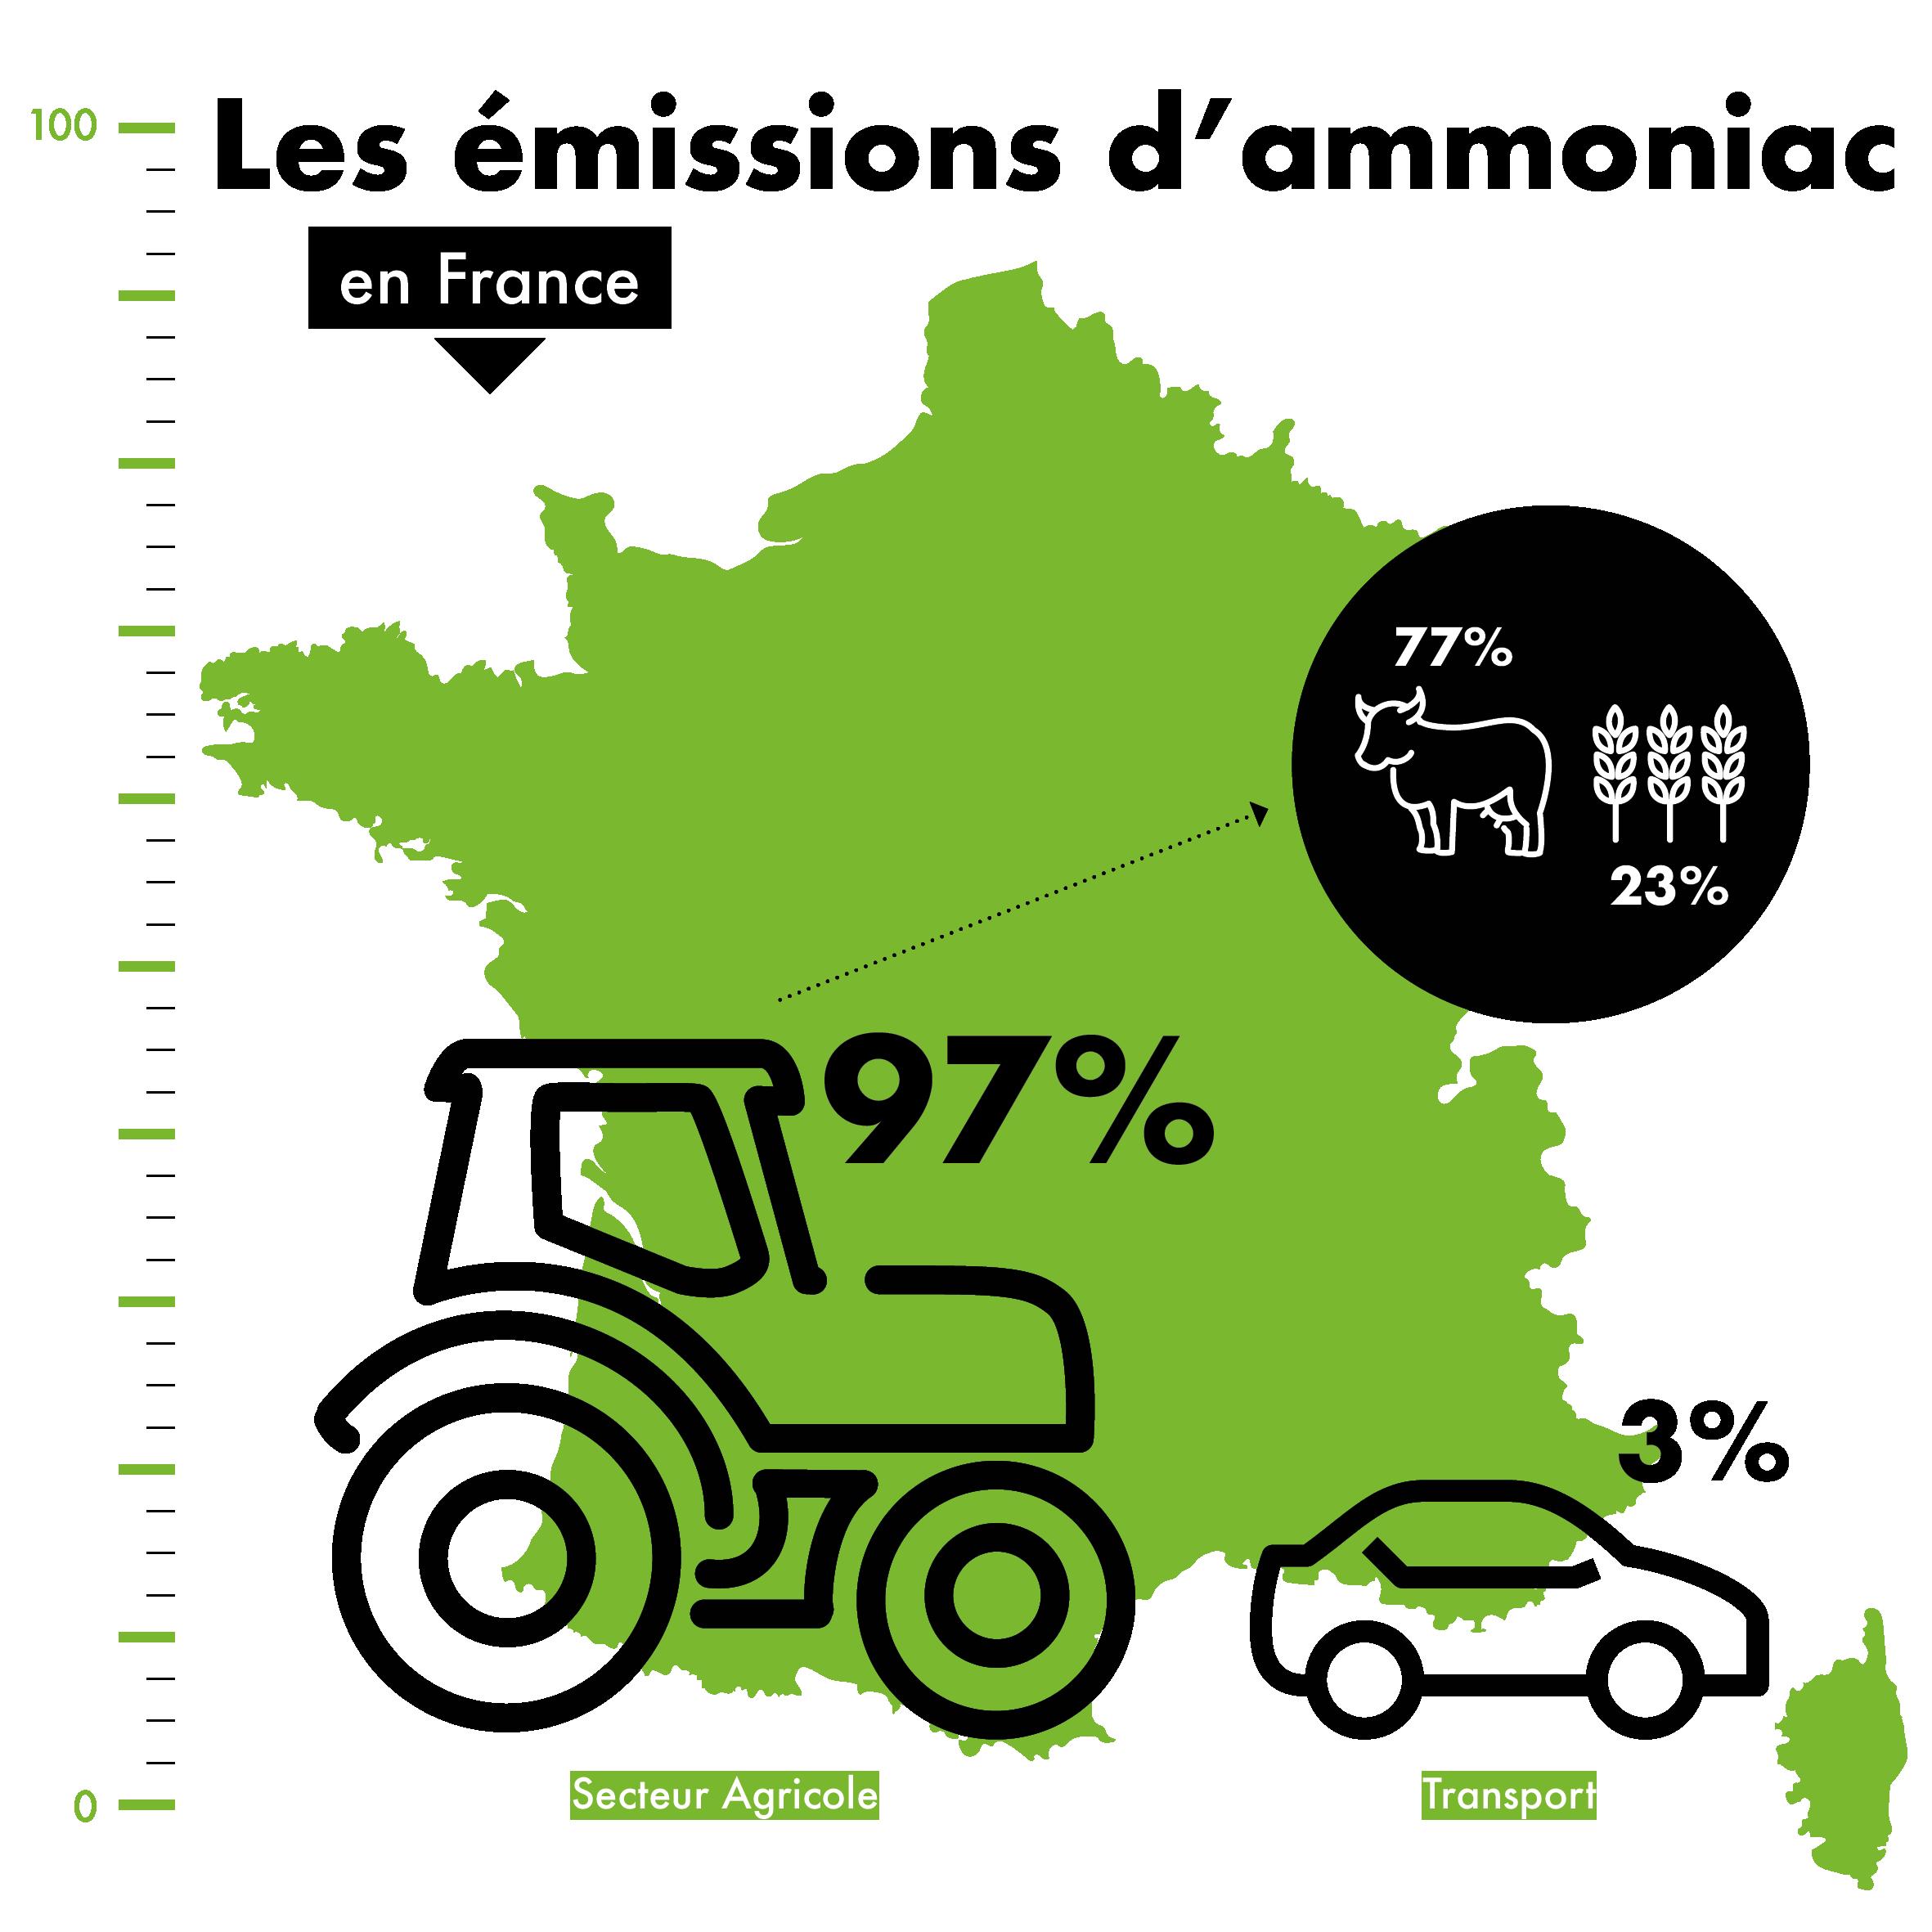 emissions-ammoniac-france.png